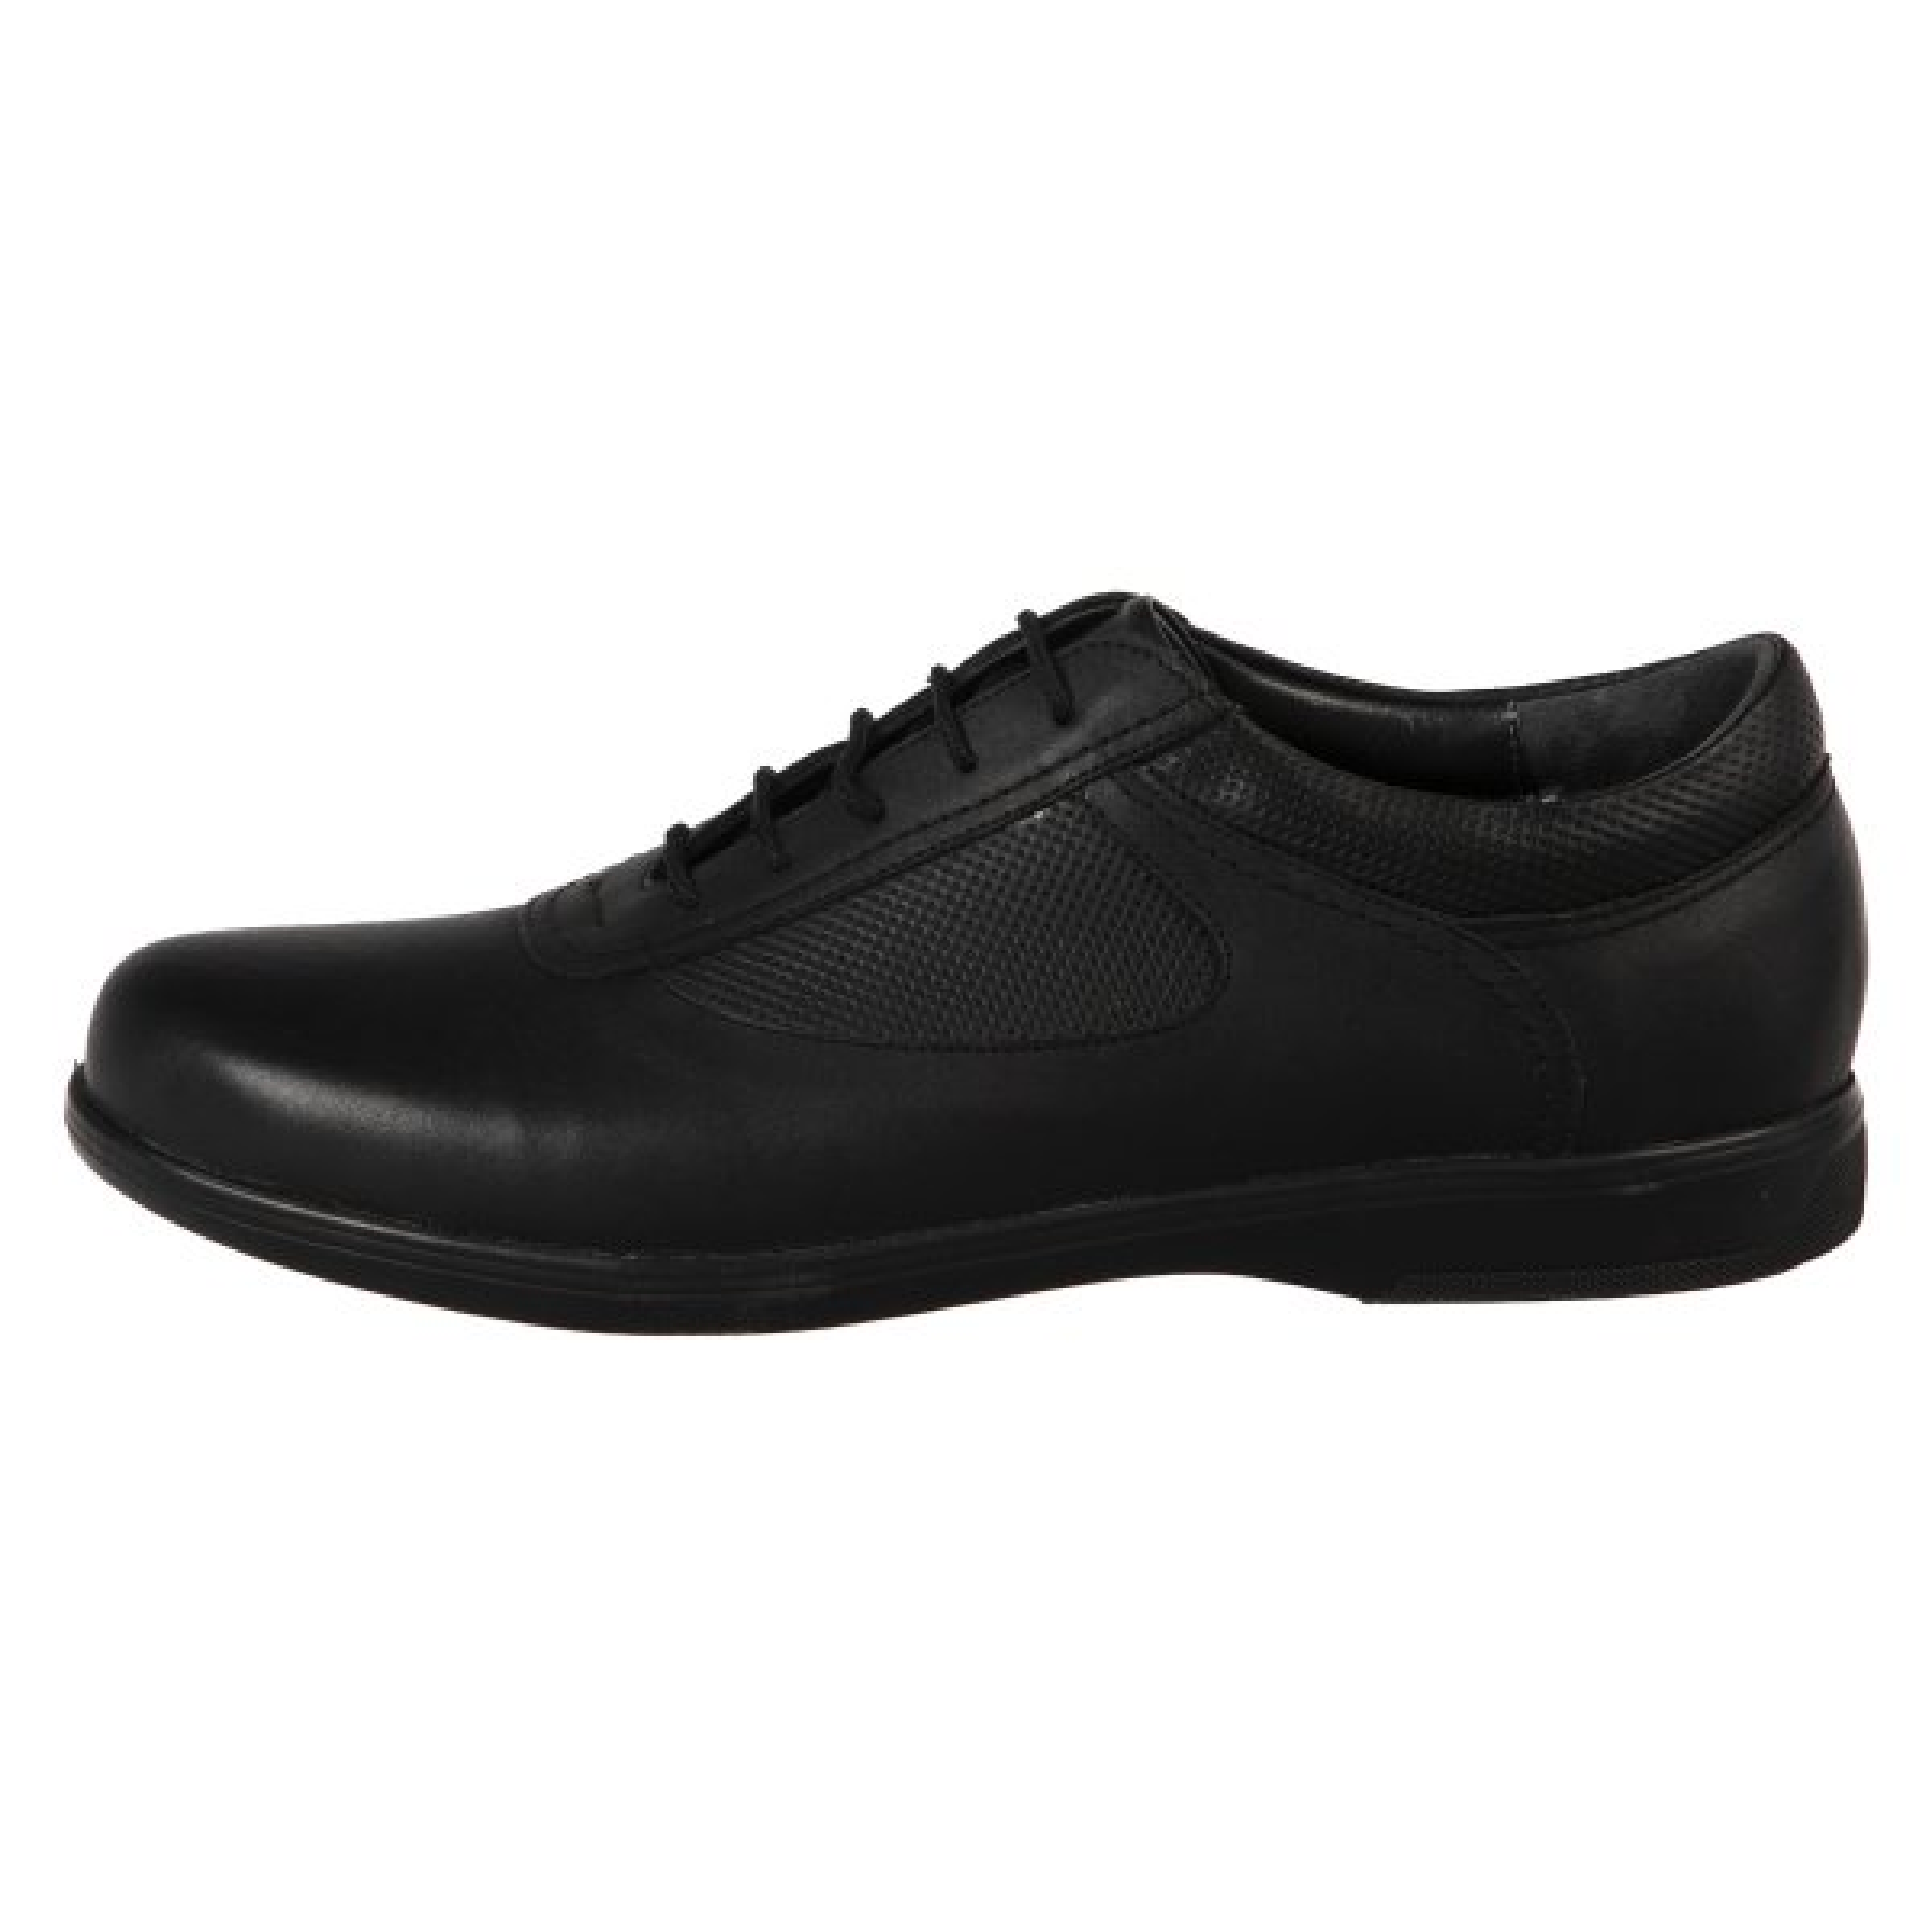 کفش روزمره مردانه دانادل مدل 7001W503101